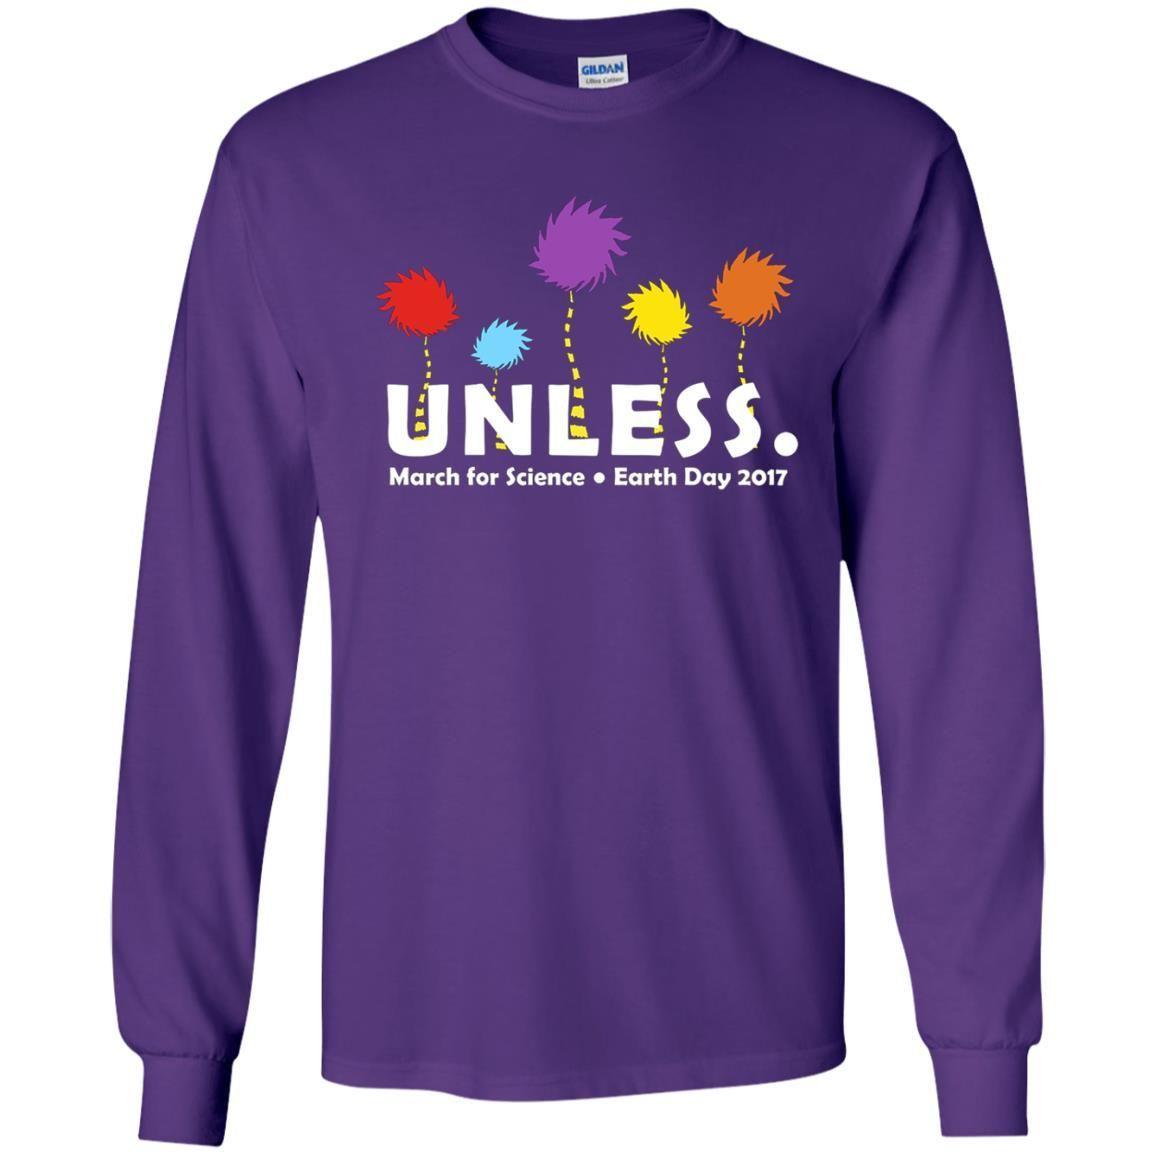 Unless March Sciene Earth Day 2017 G240 Gildan LS Ultra Cotton T-Shirt